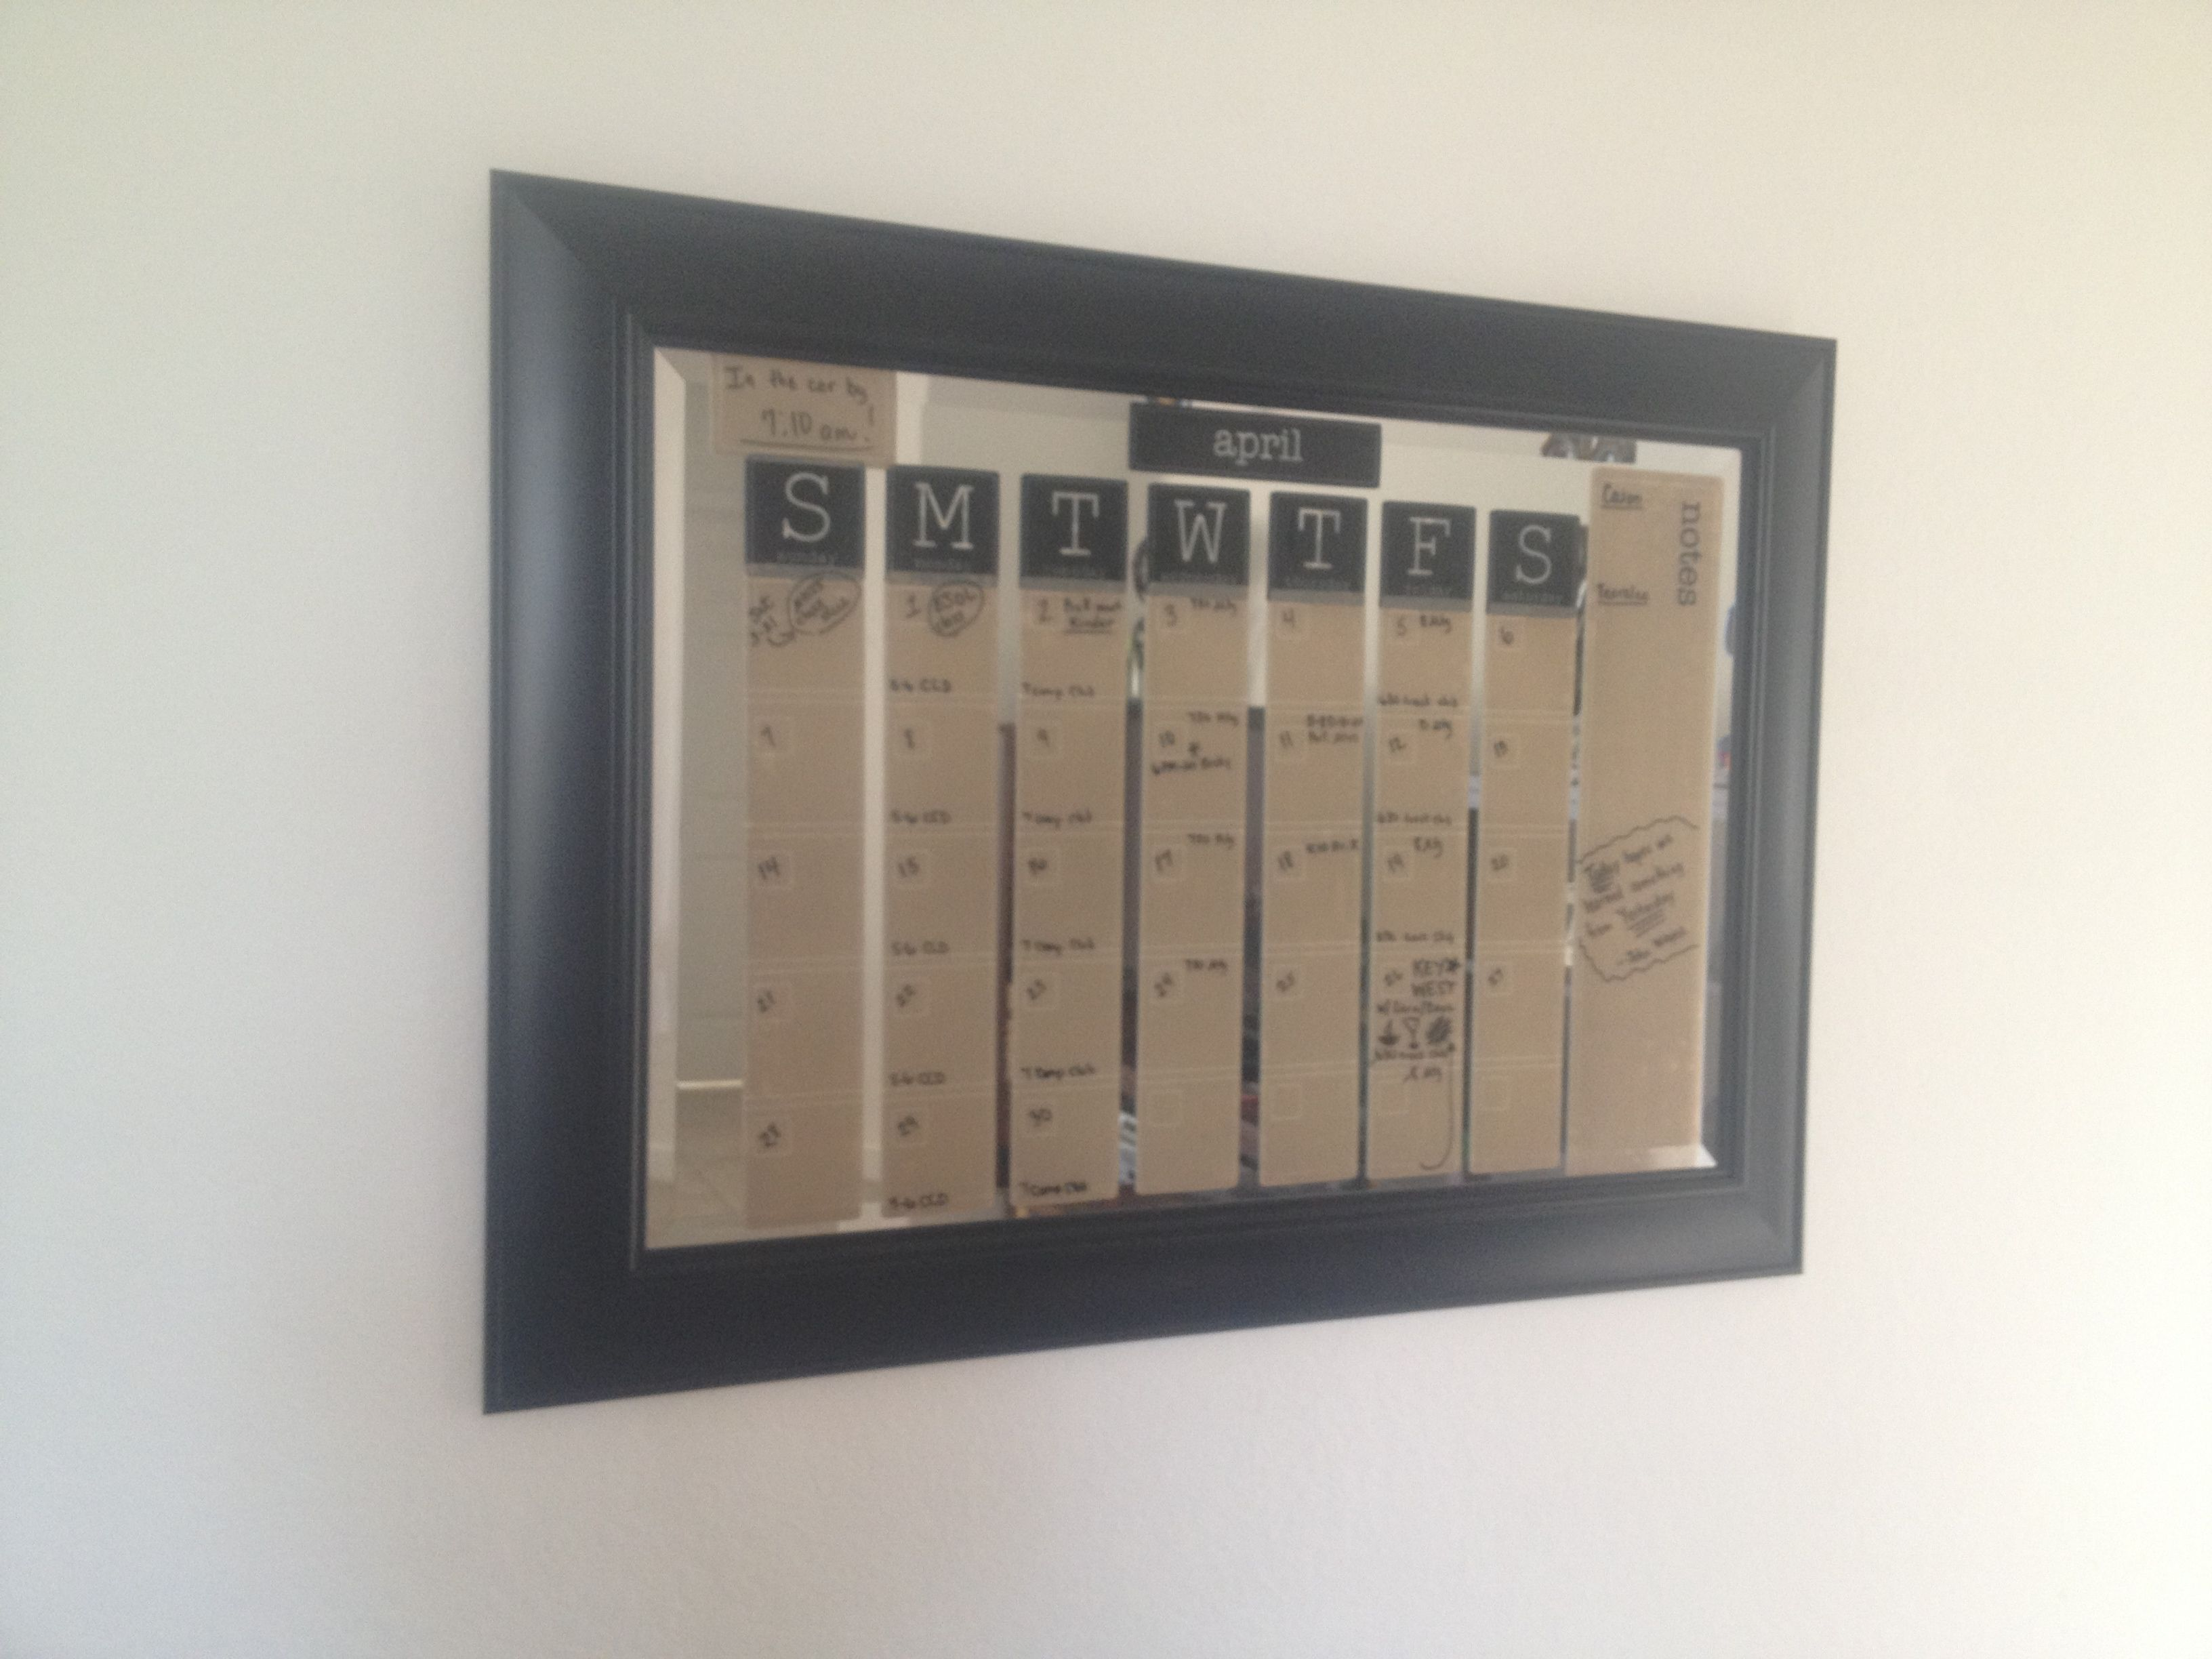 Calendar Planner Target : Old unused mirror dry erase sticky calendar target organization